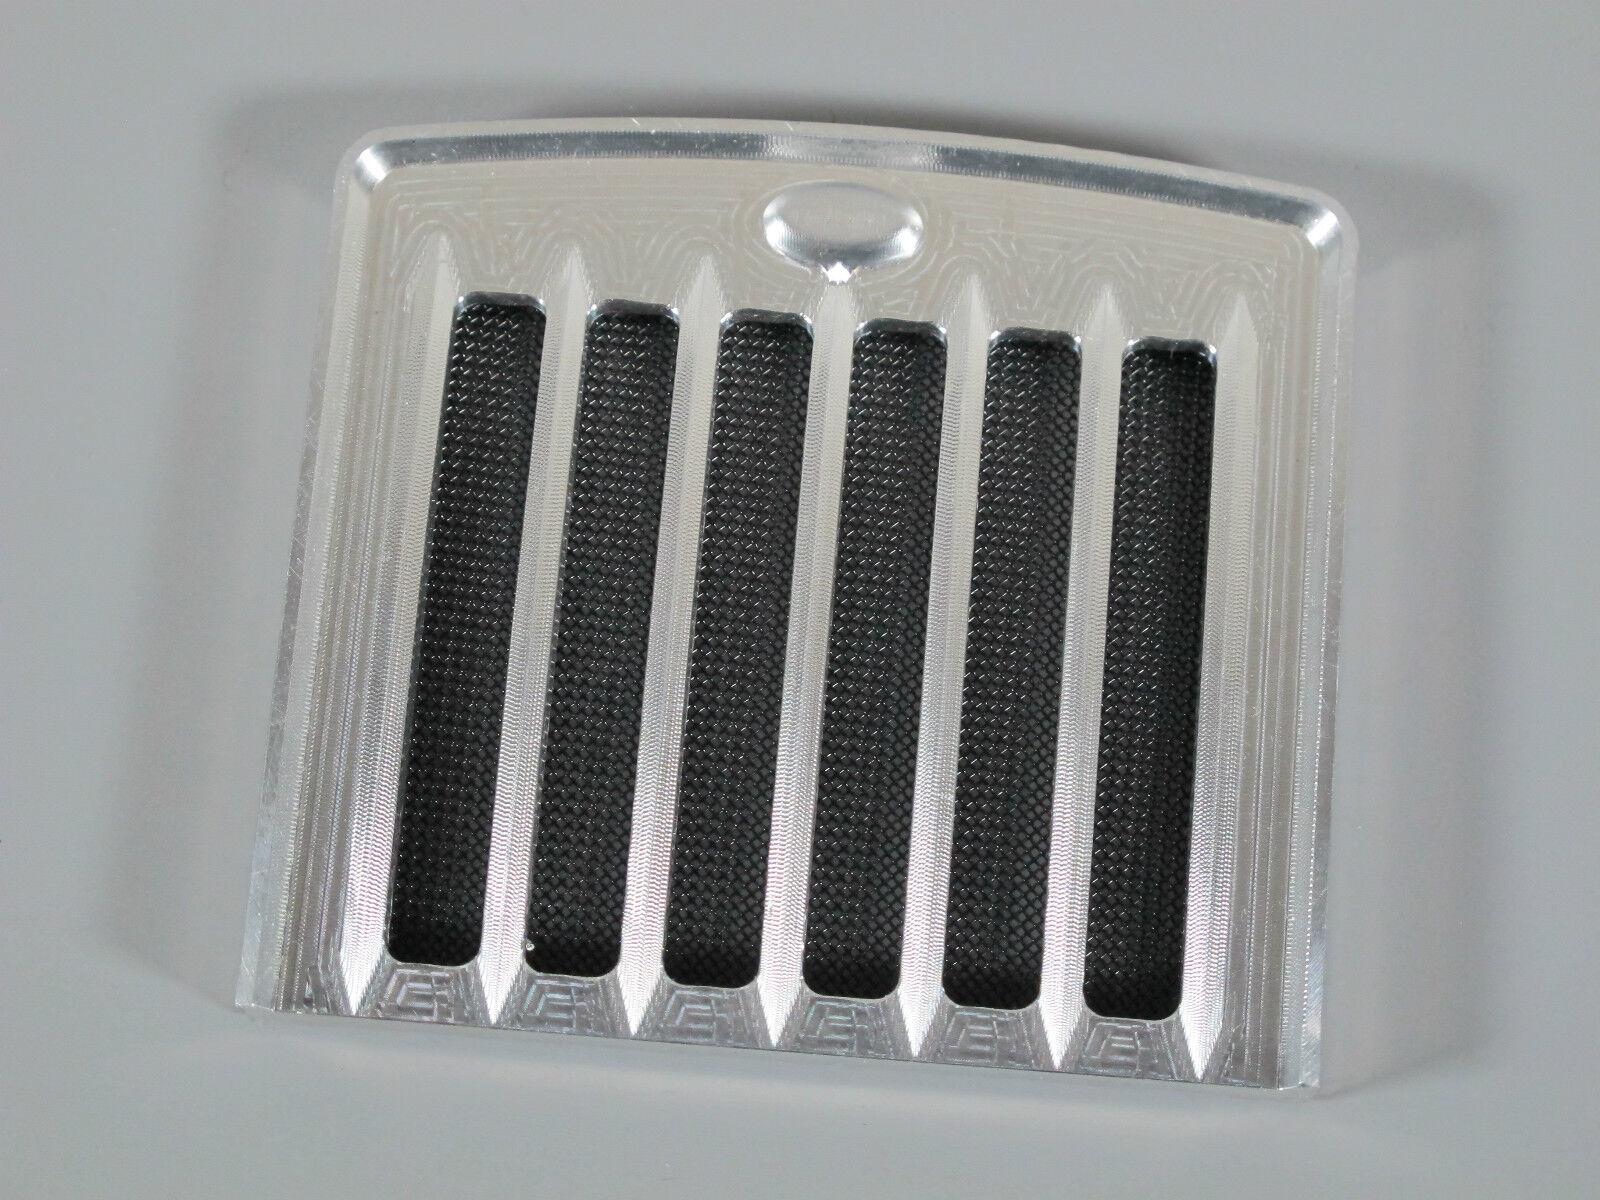 New Front Aluminum Grill Guard plate with mesh insert Tamiya King Grand Hauler